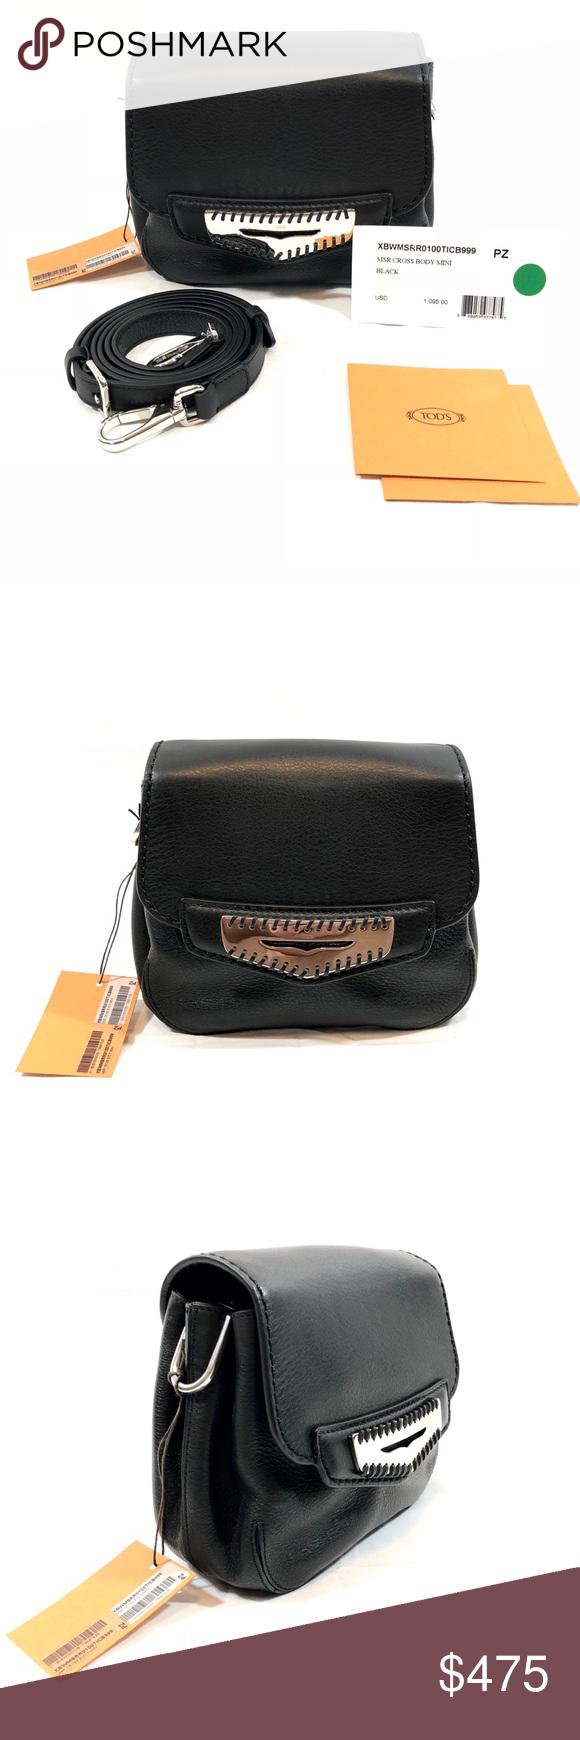 c80808fdf43 Tod's Mini Mask Black Leather Crossbody Bag NWT Tod's Mini Mask Leather Crossbody  Bag Retail Price